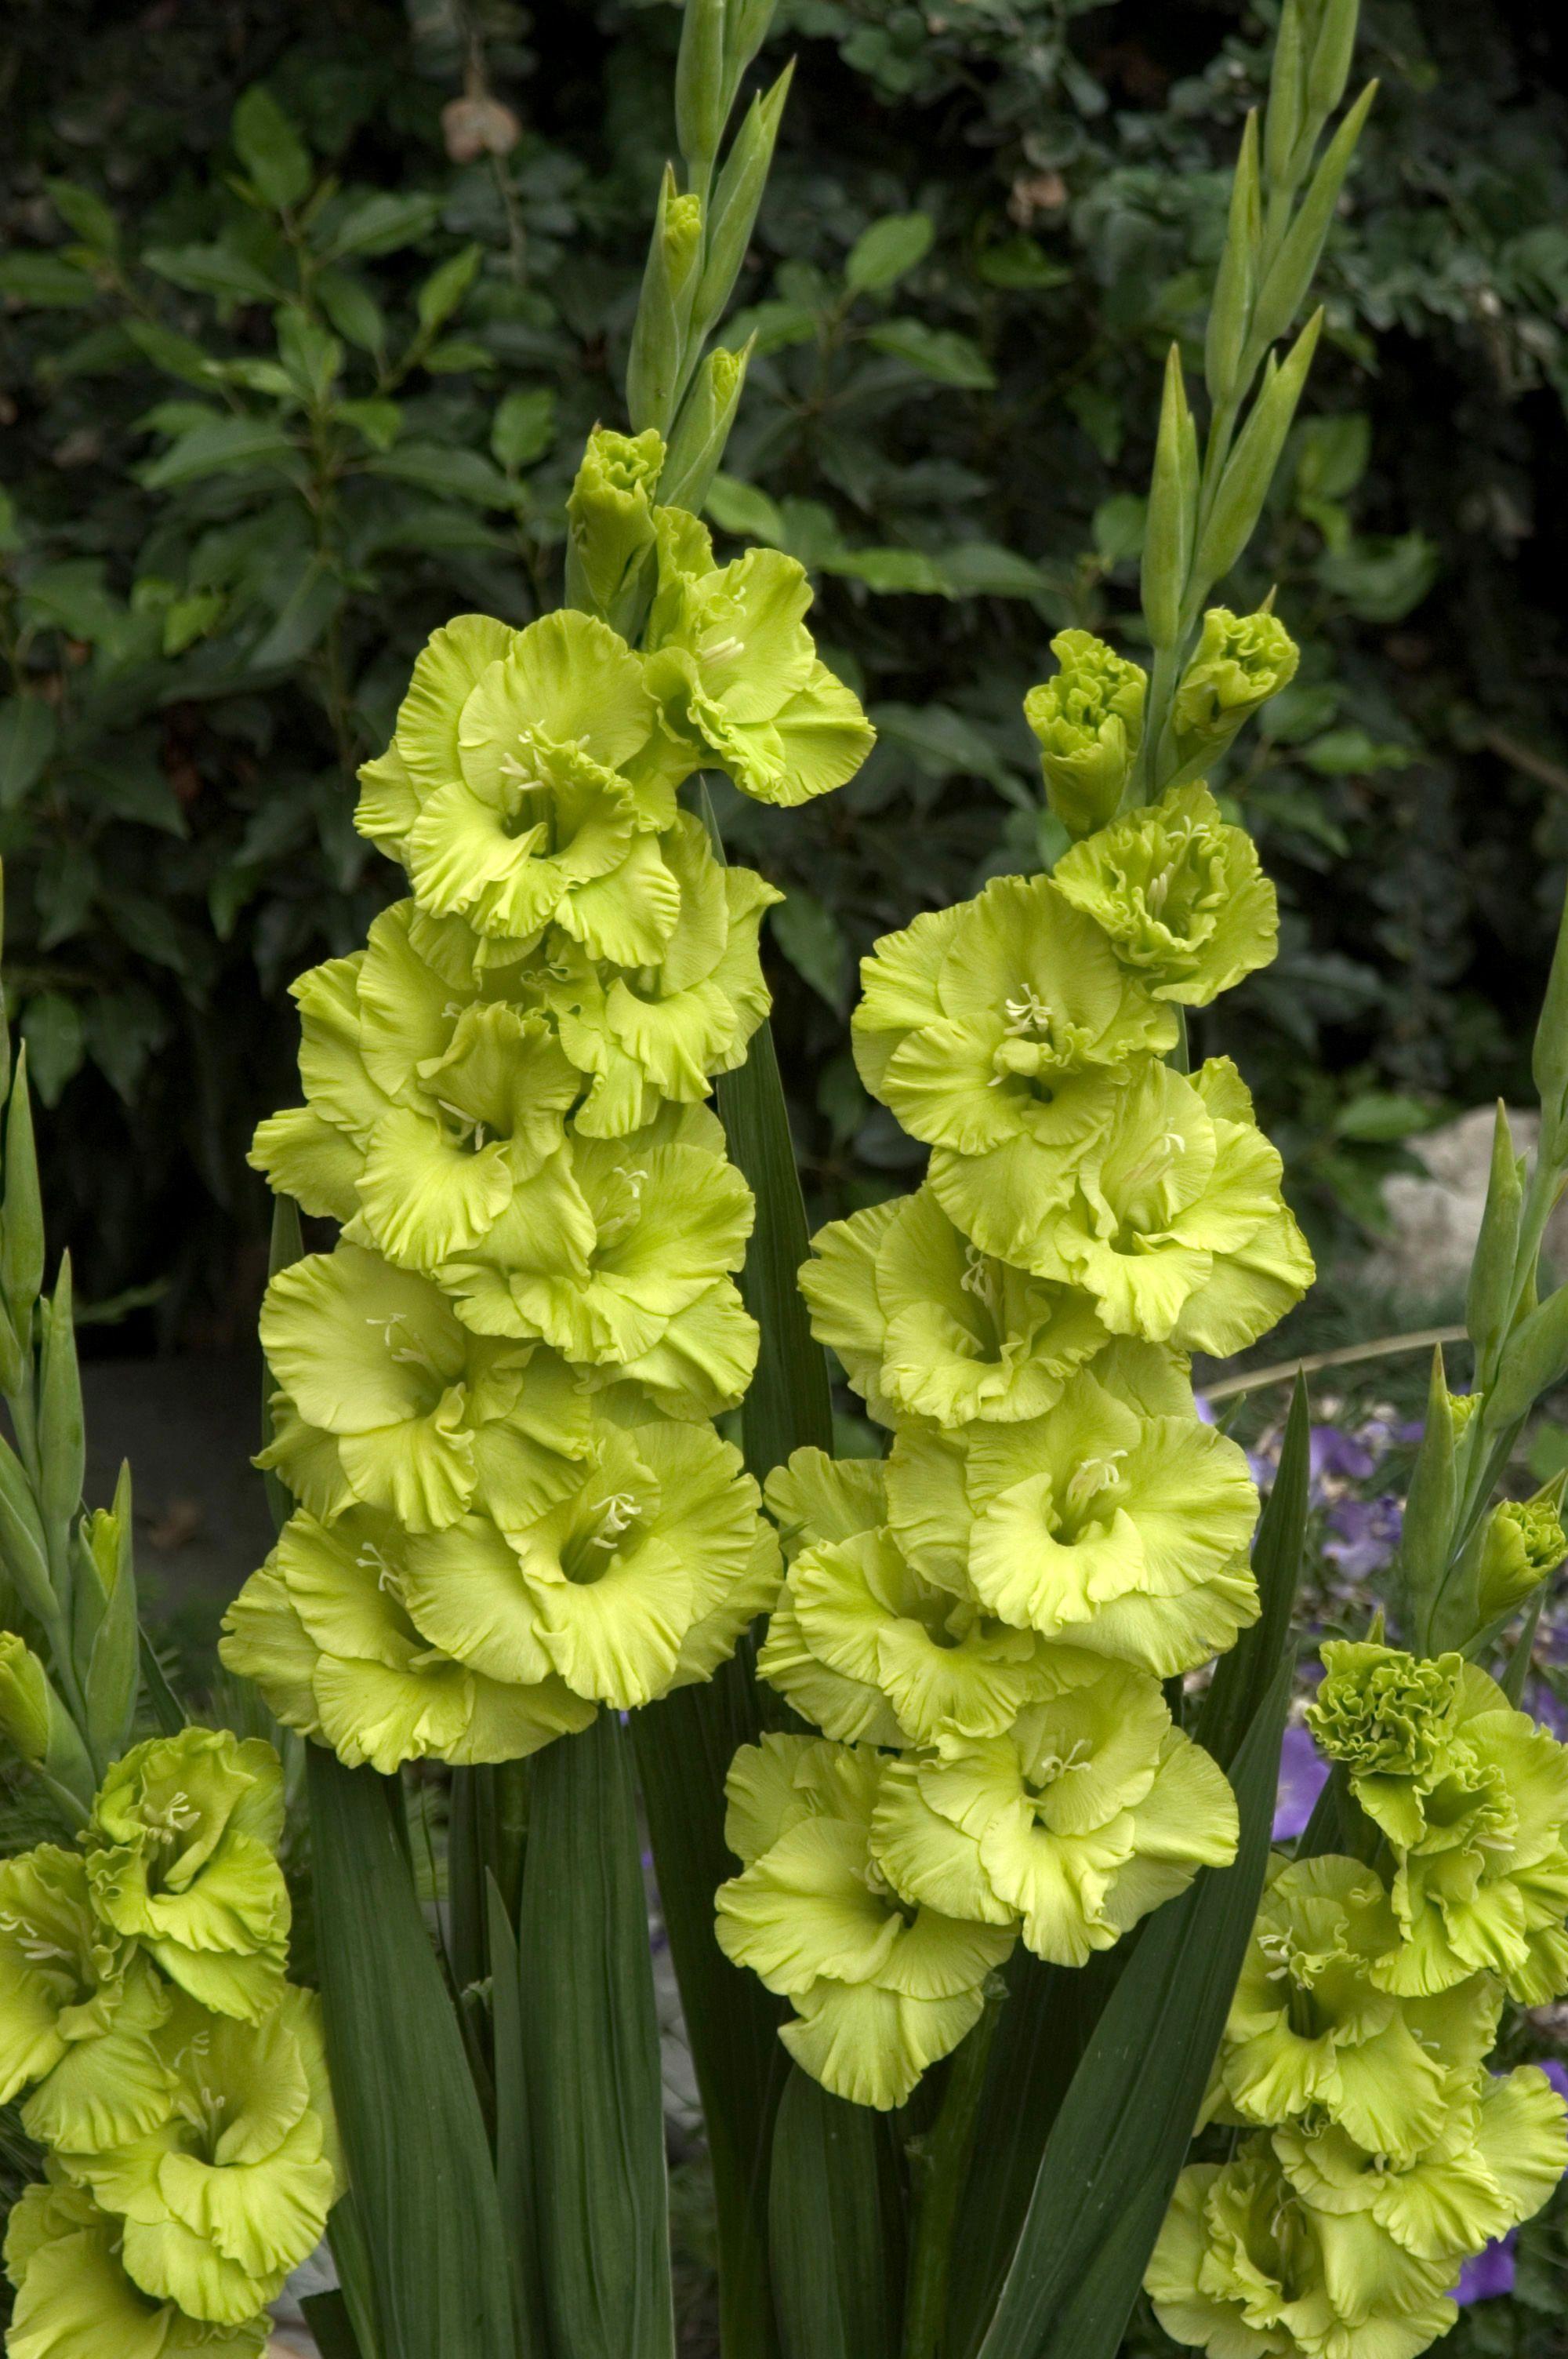 Pin By Amanda On Old New Borrowed Blue Gladiolus Plants Uk Plants